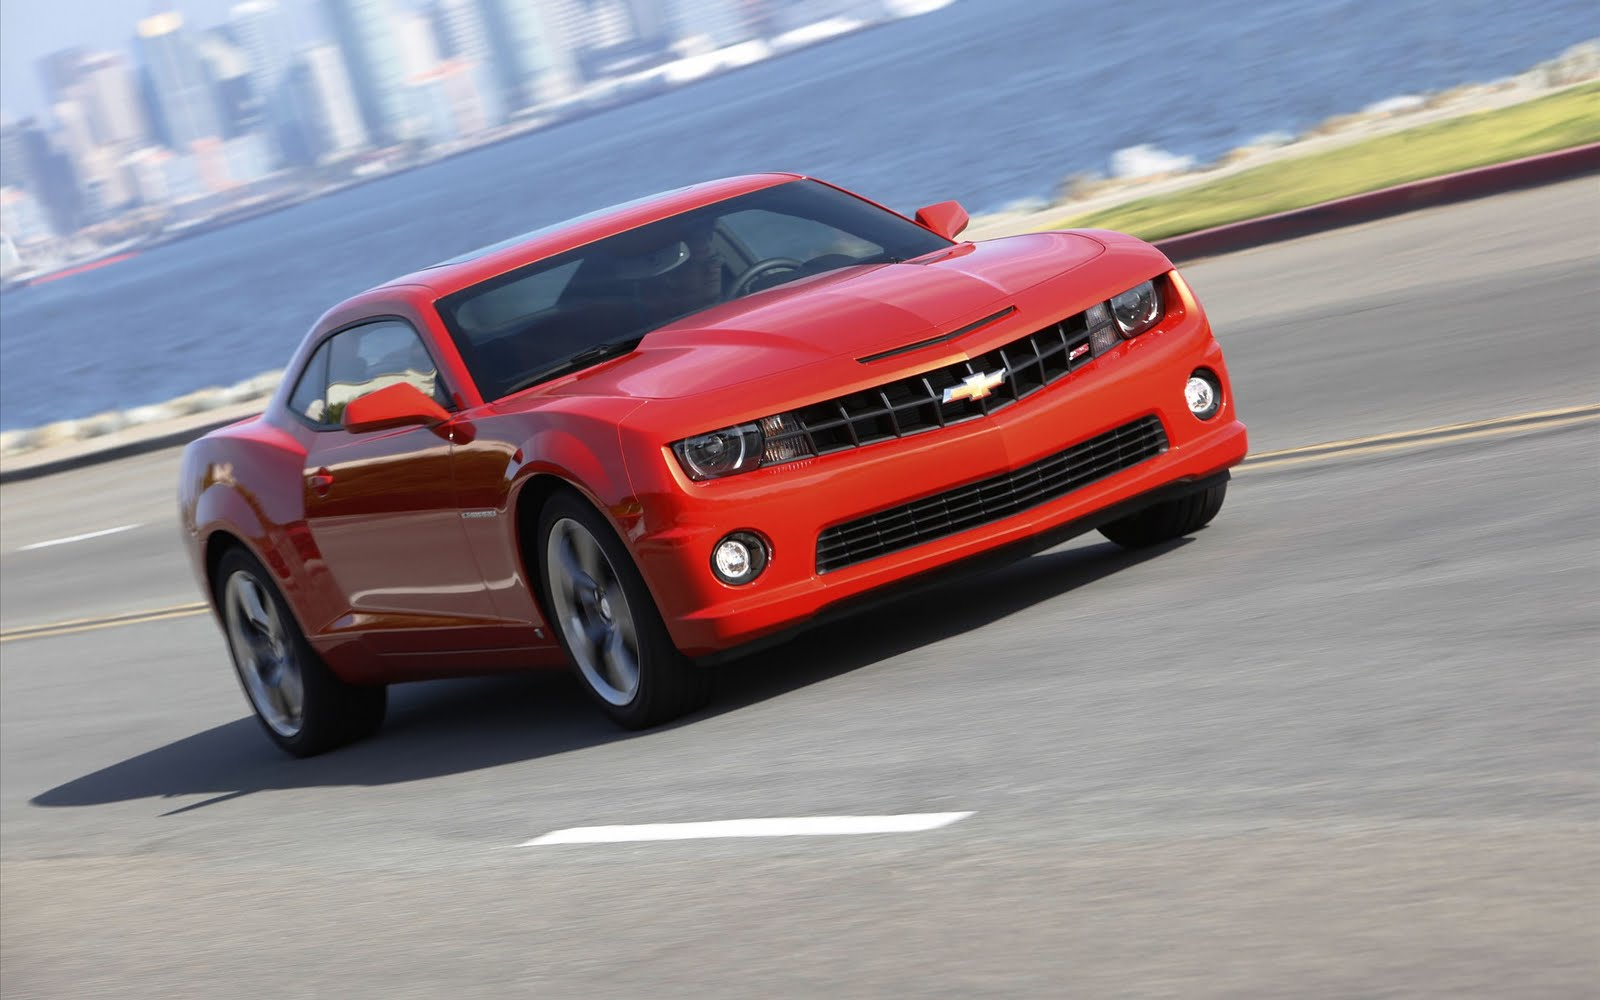 http://4.bp.blogspot.com/-WXlGje6LCG8/Tm9zBF5pSiI/AAAAAAAAI5o/5PcJOY6zwjk/s1600/2010-Chevrolet-Camaro-SS-widescreen-22%255B1%255D.jpg